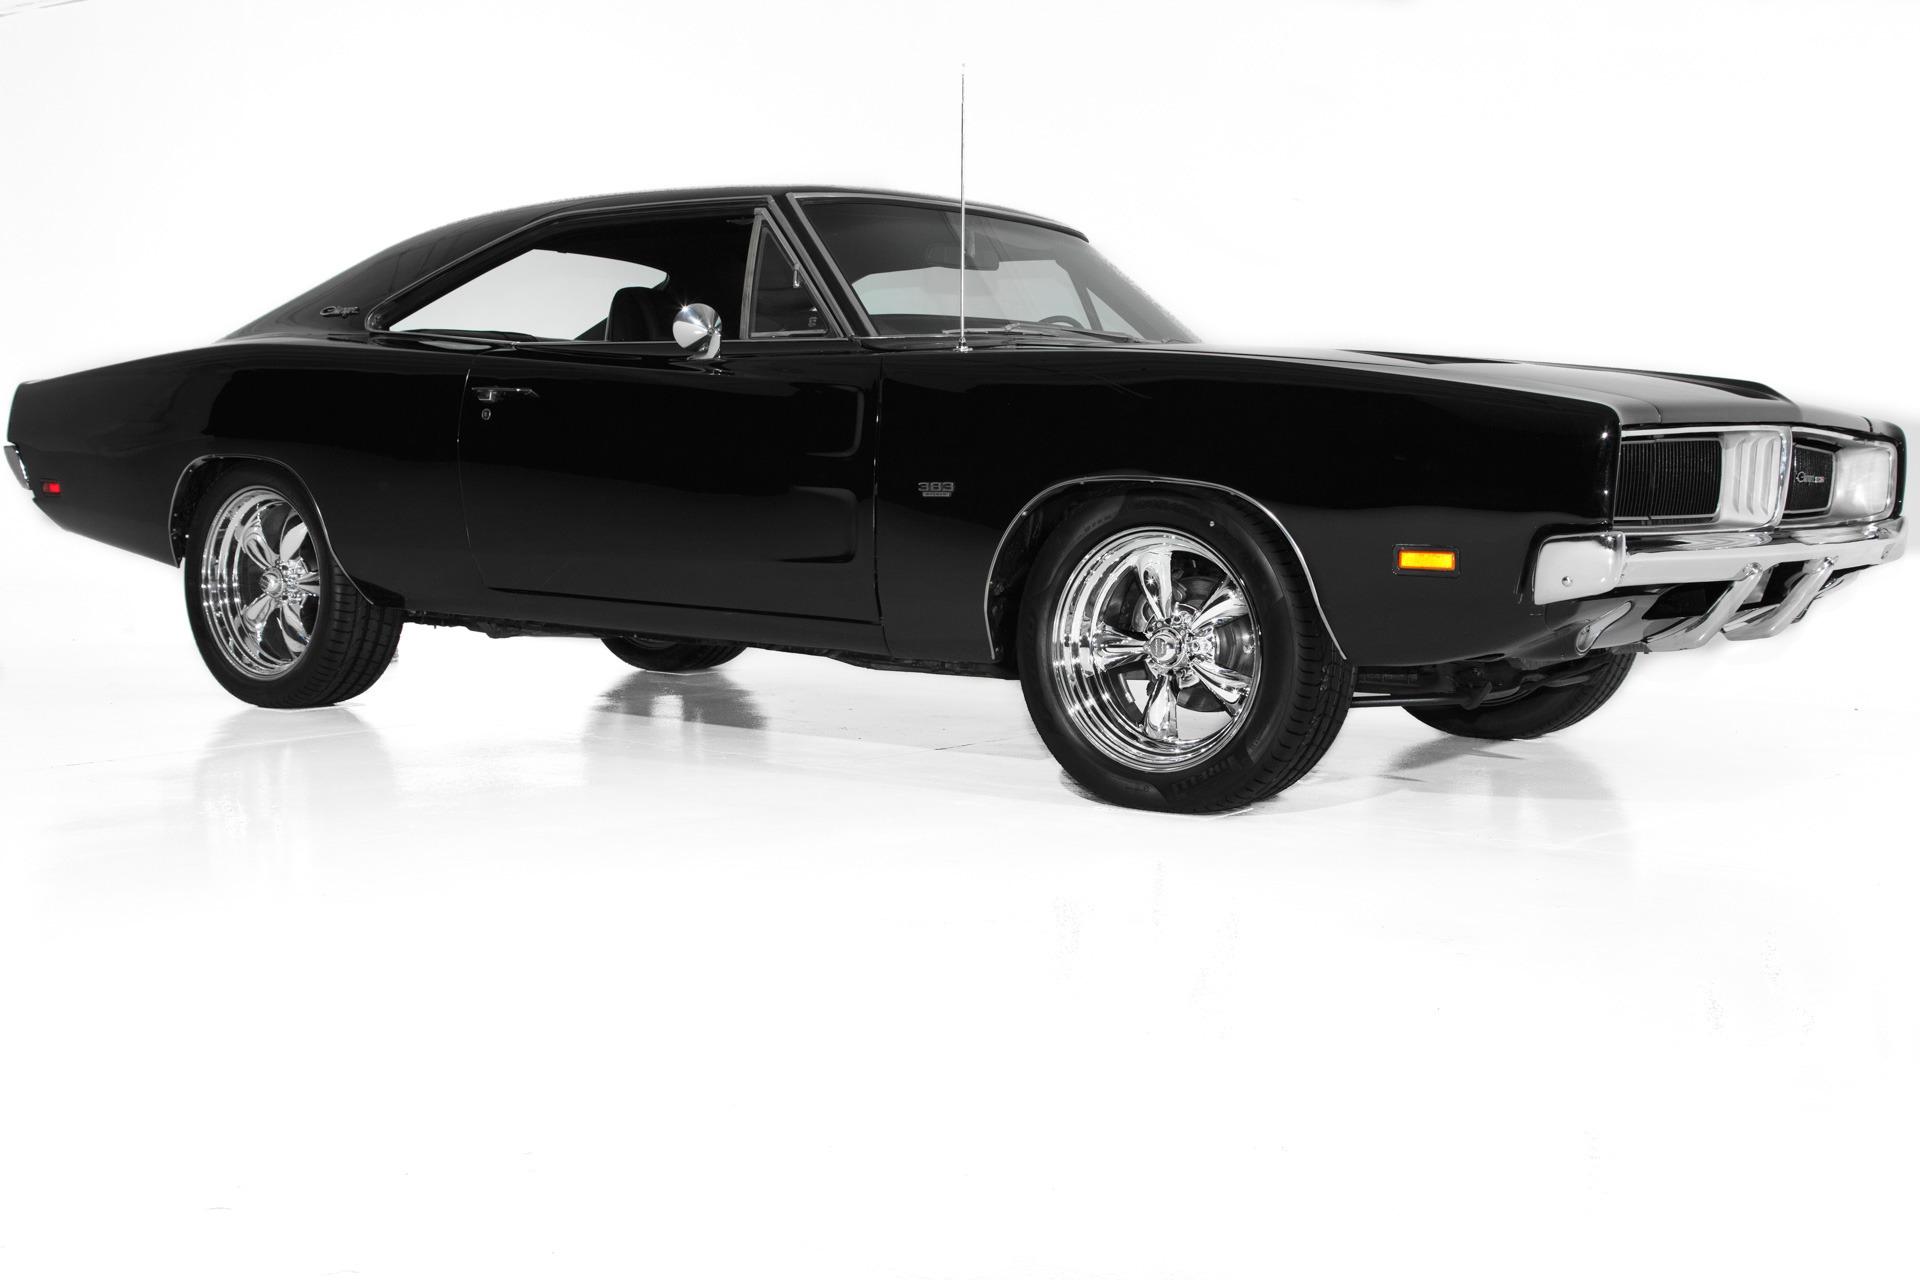 Photo 1969 Dodge Charger Black 383 Big Block, 4 speed